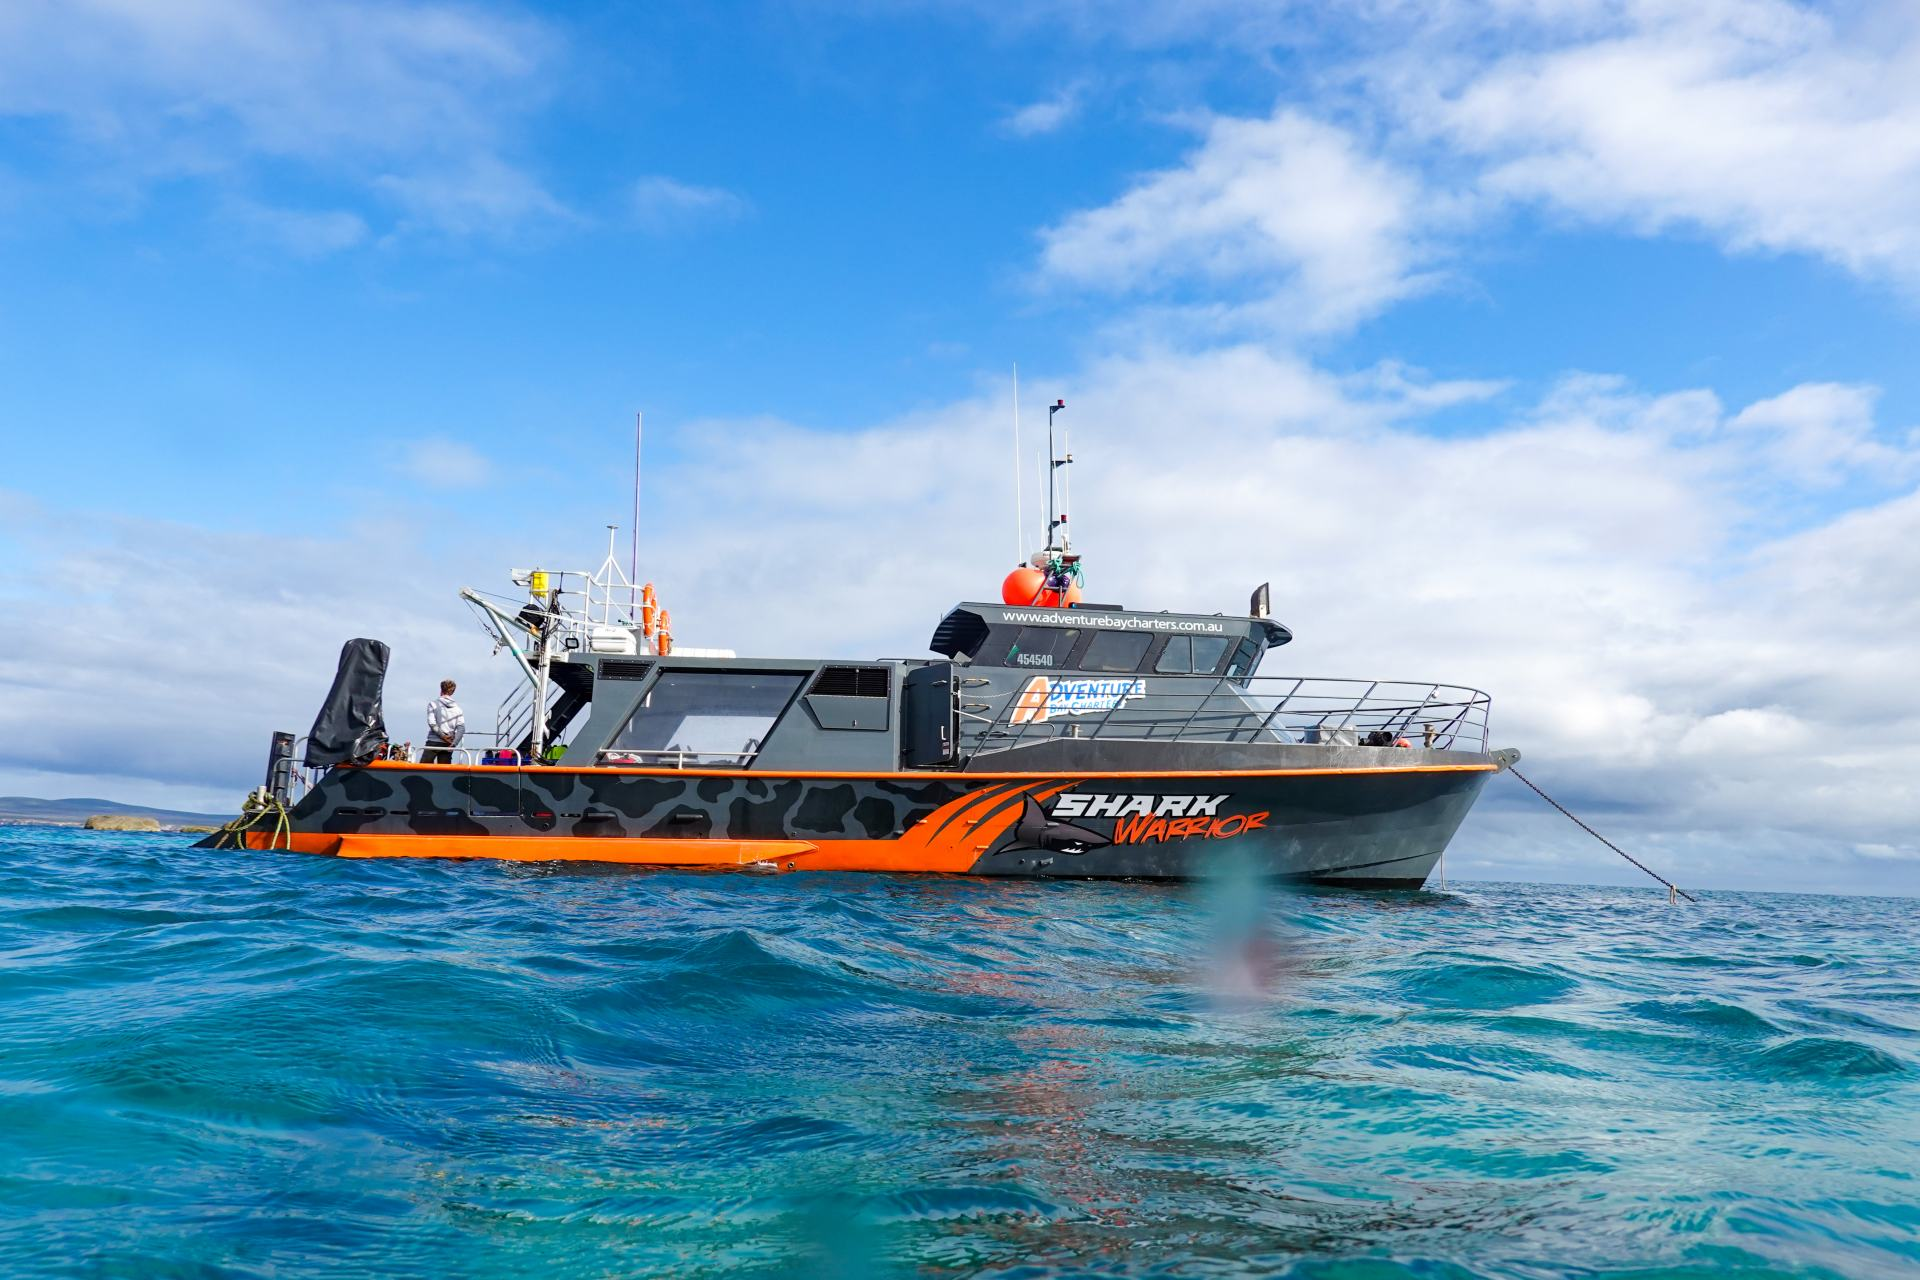 shark warrior boat